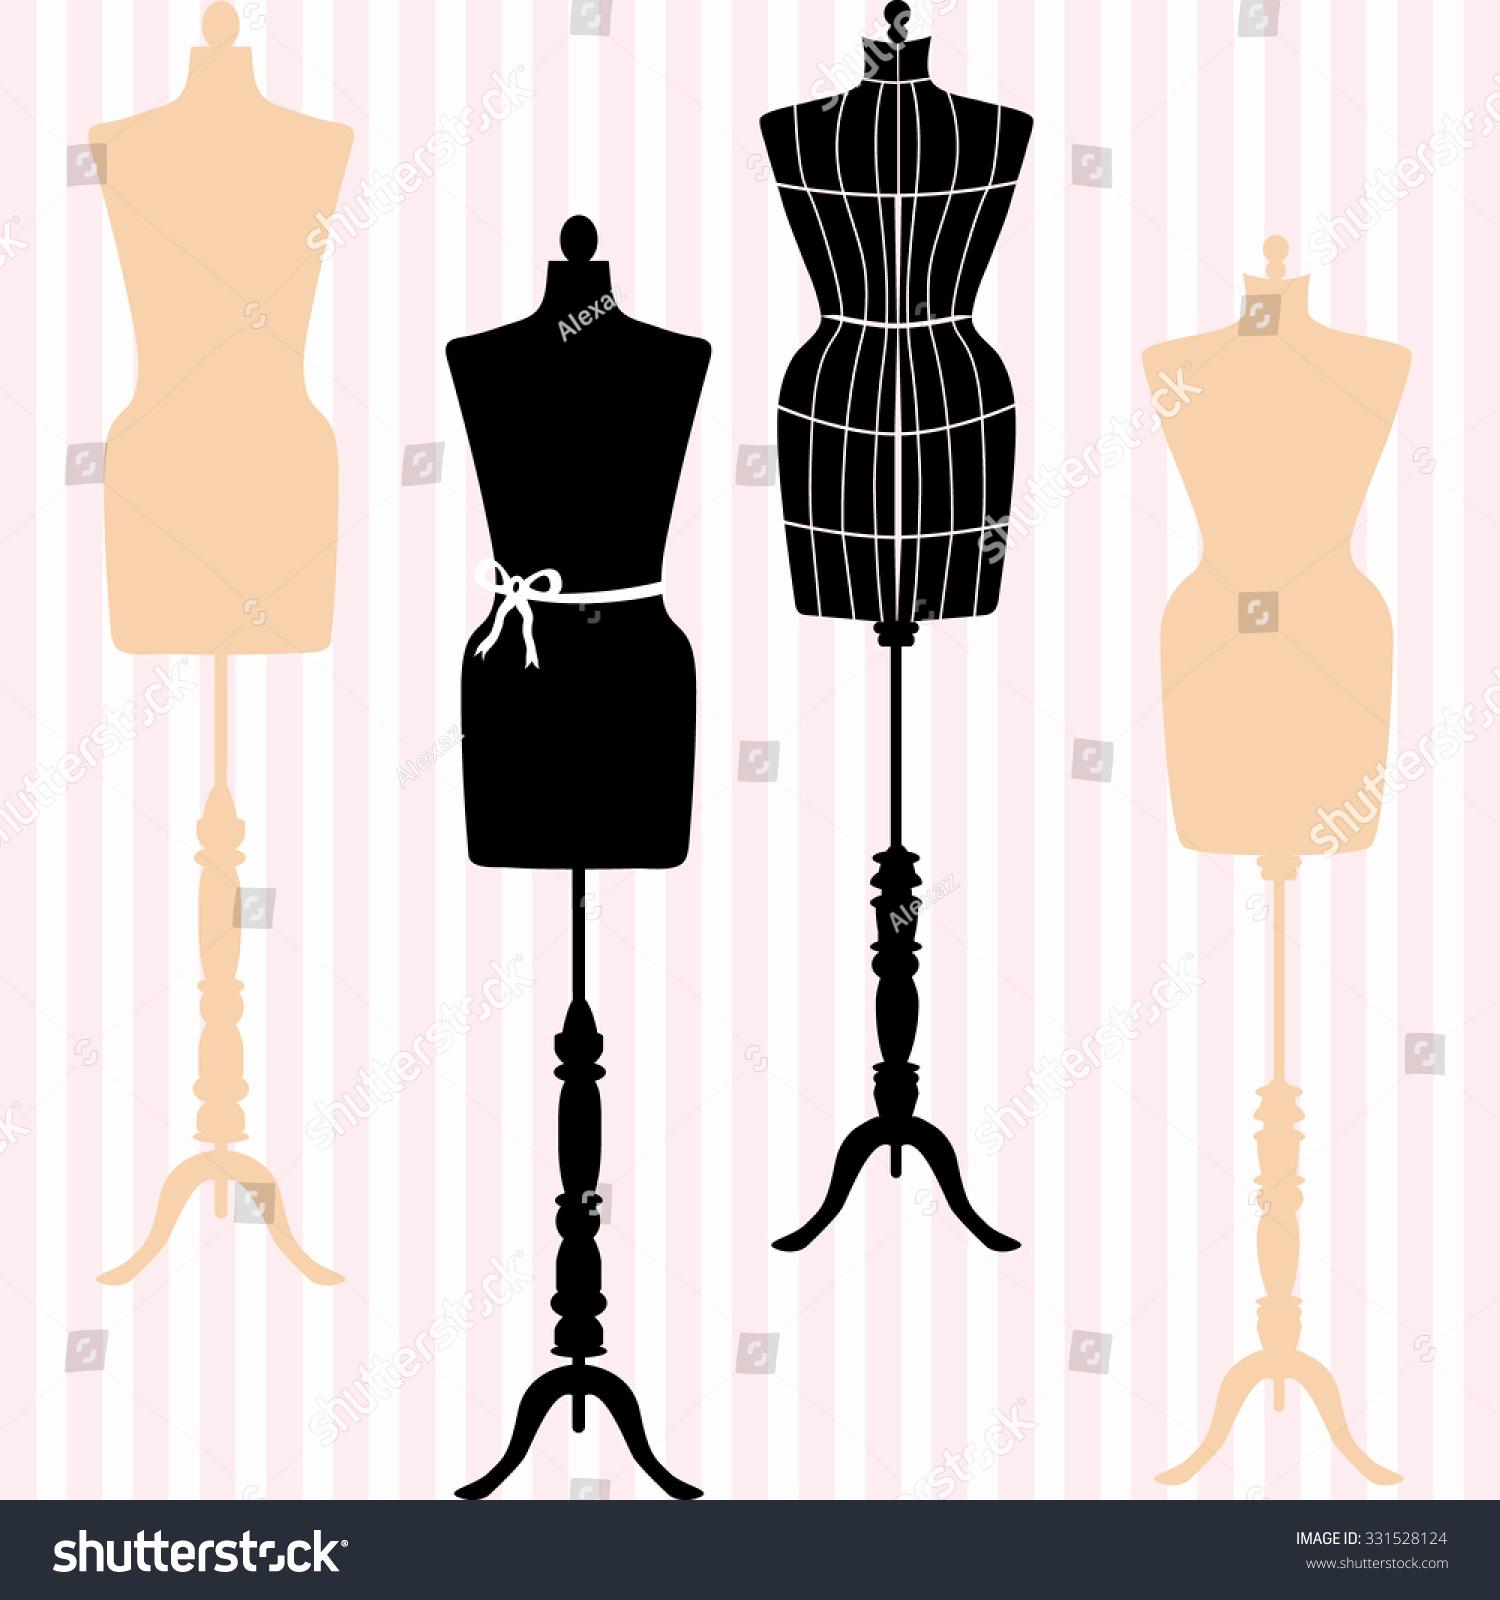 1500x1600 Dress Form Mannequin Luxury Mannequin Silhouette Fashion Dress